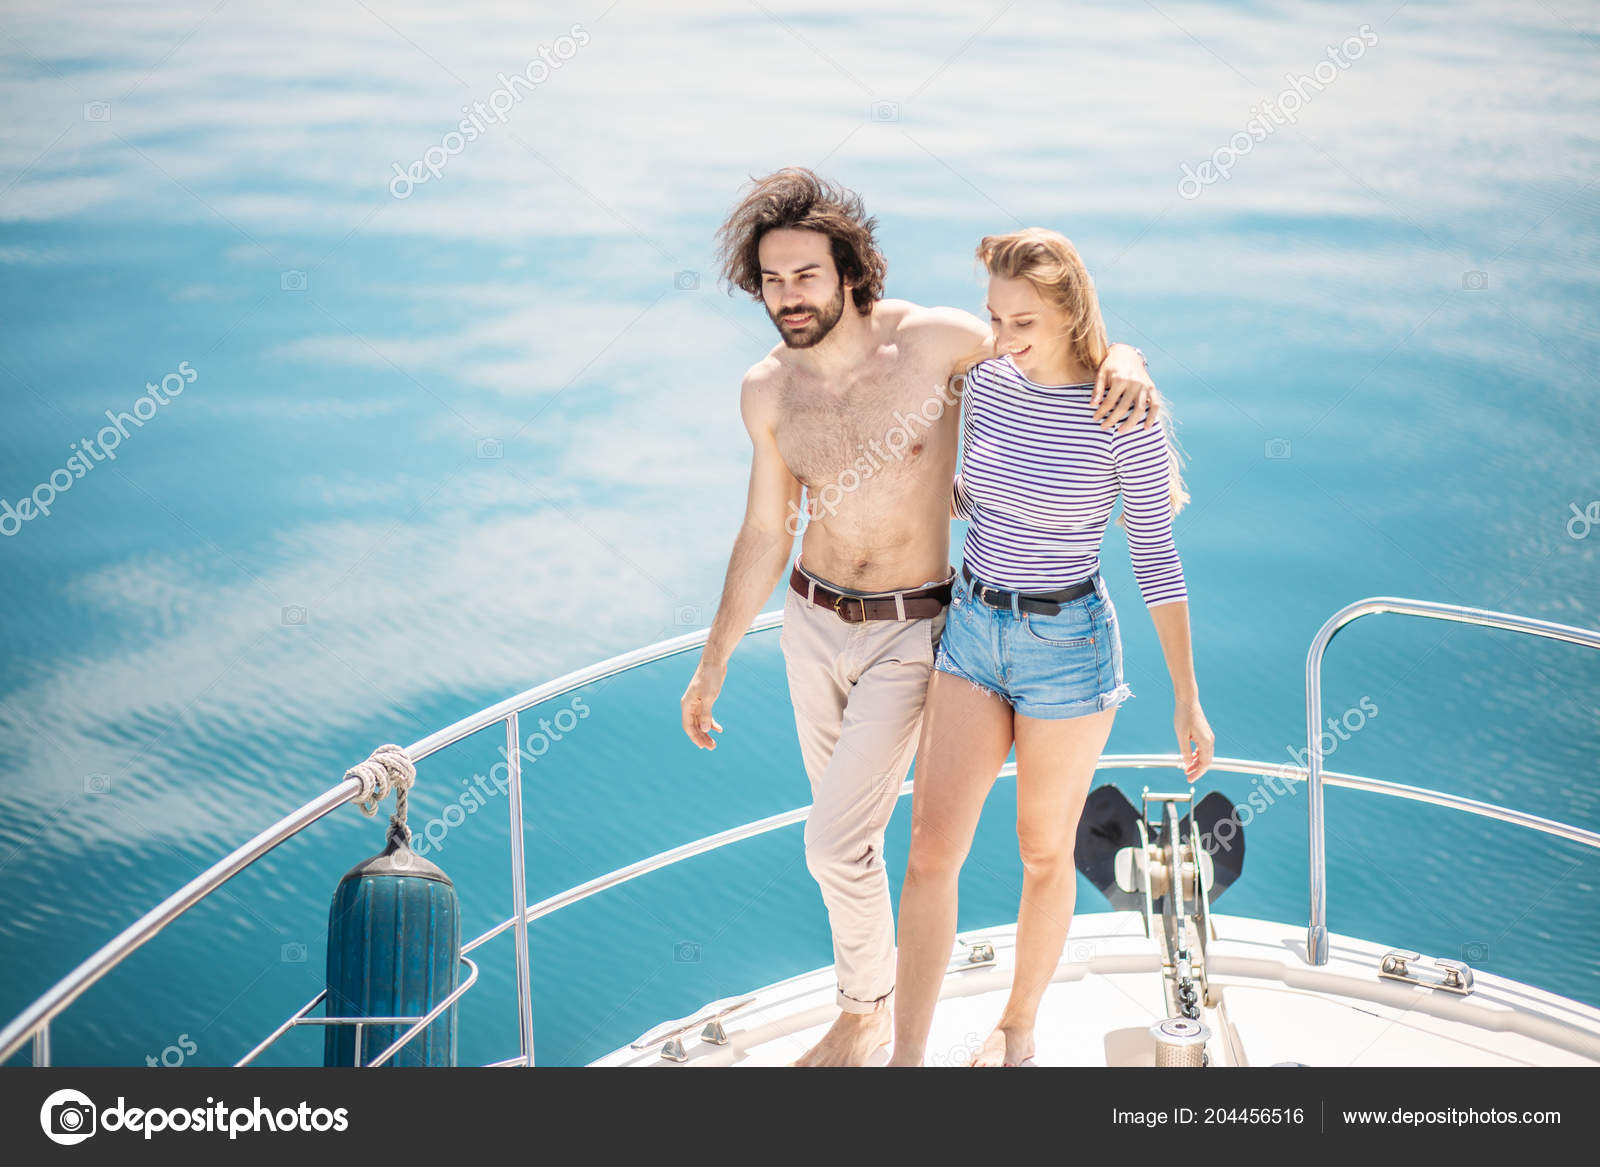 Hot ρομαντική dating παιχνίδια ιστοσελίδες γνωριμιών κάρικφέργκους